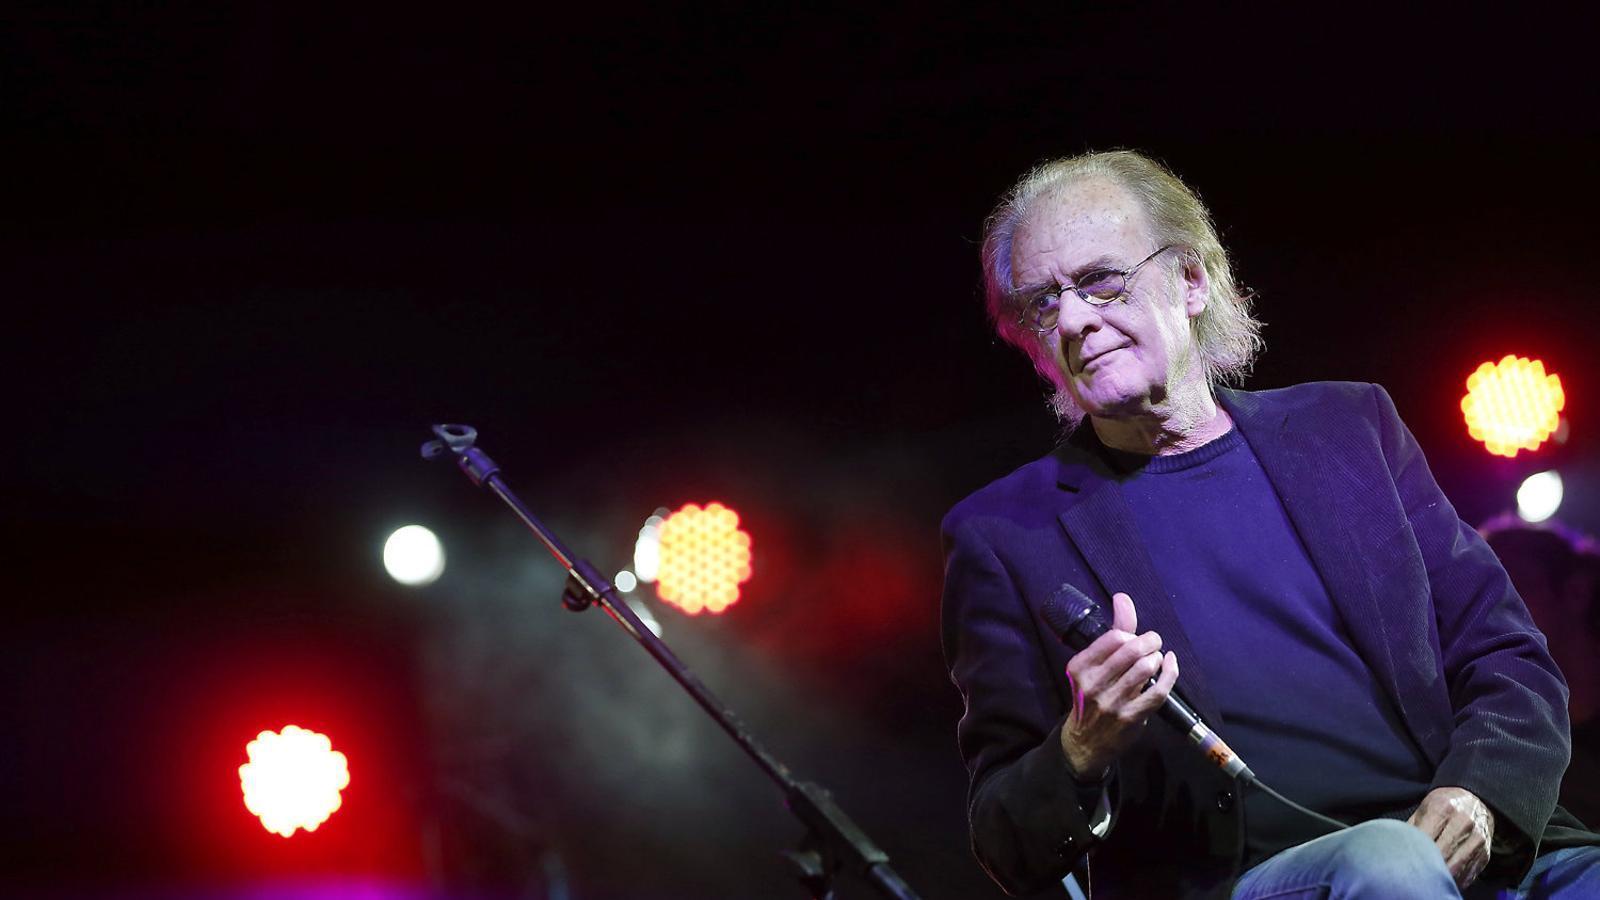 Luis Eduardo Aute durant un concert celebrat al barri madrileny de Vallecas el 4 de maig del 2016, uns mesos abans de patir un infart.